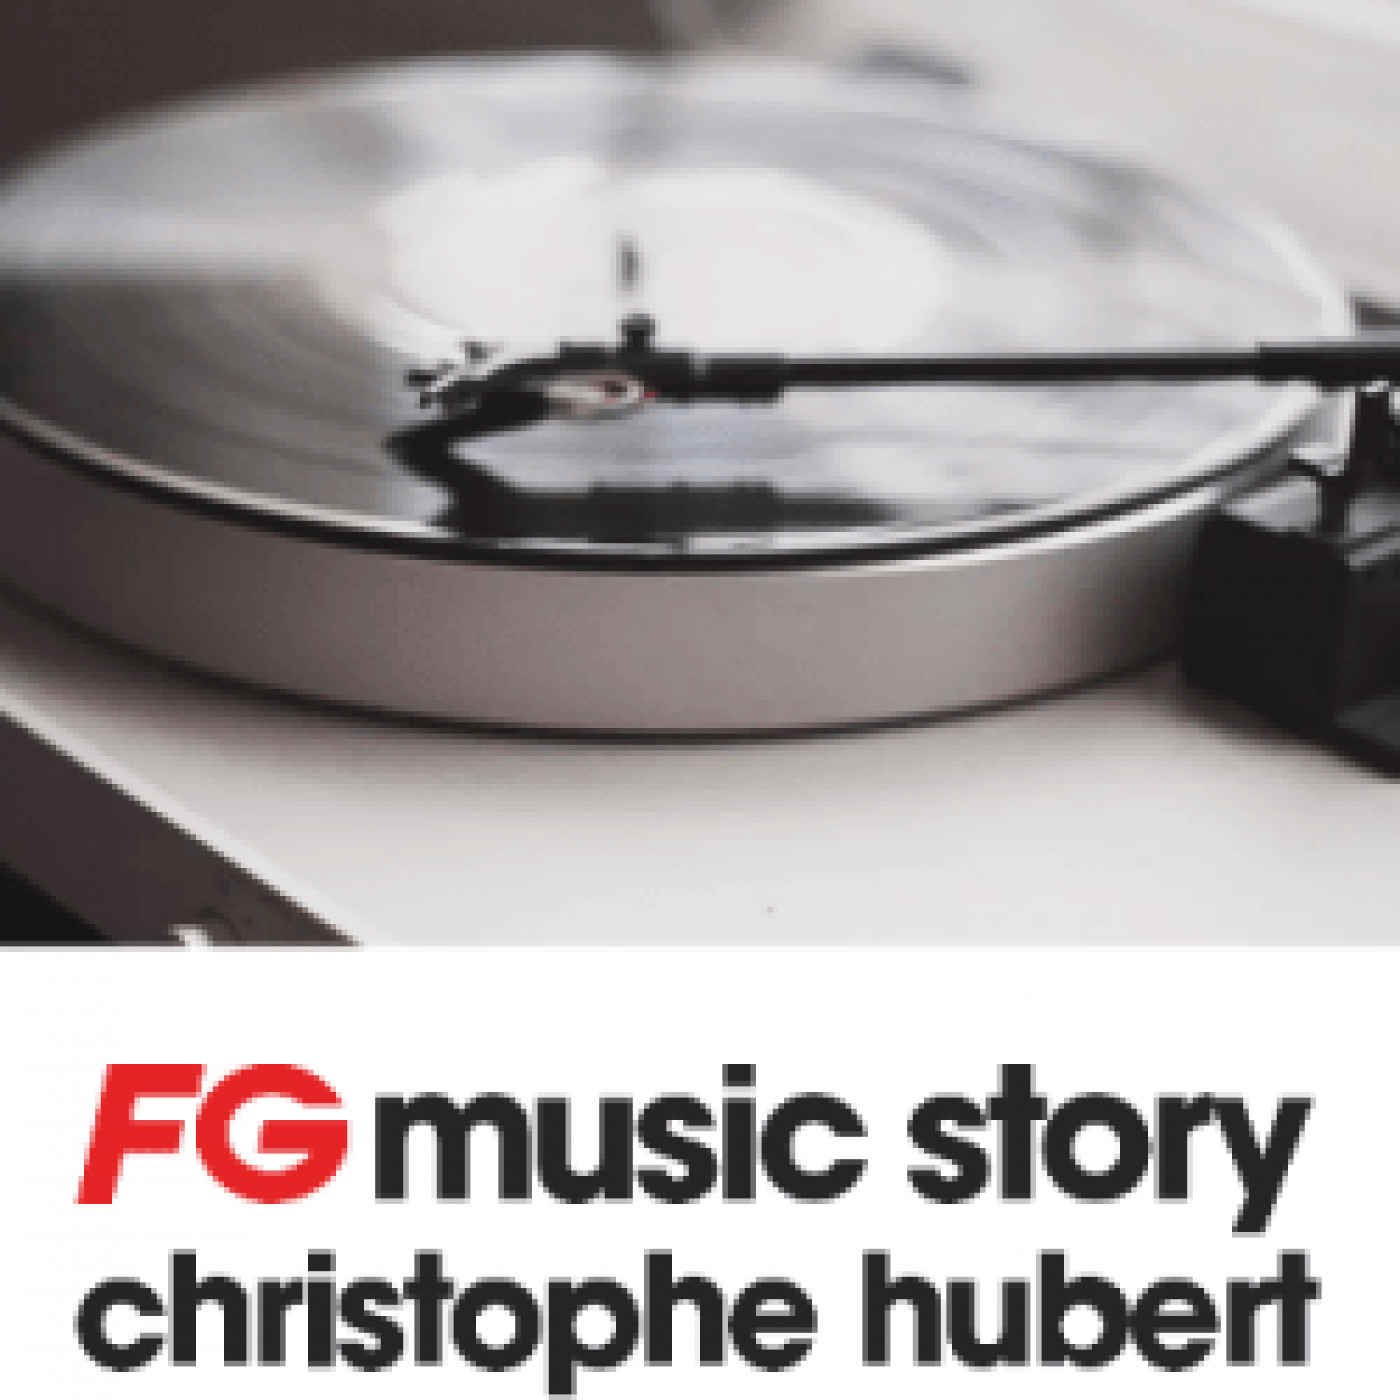 FG MUSIC STORY : ICONA POP